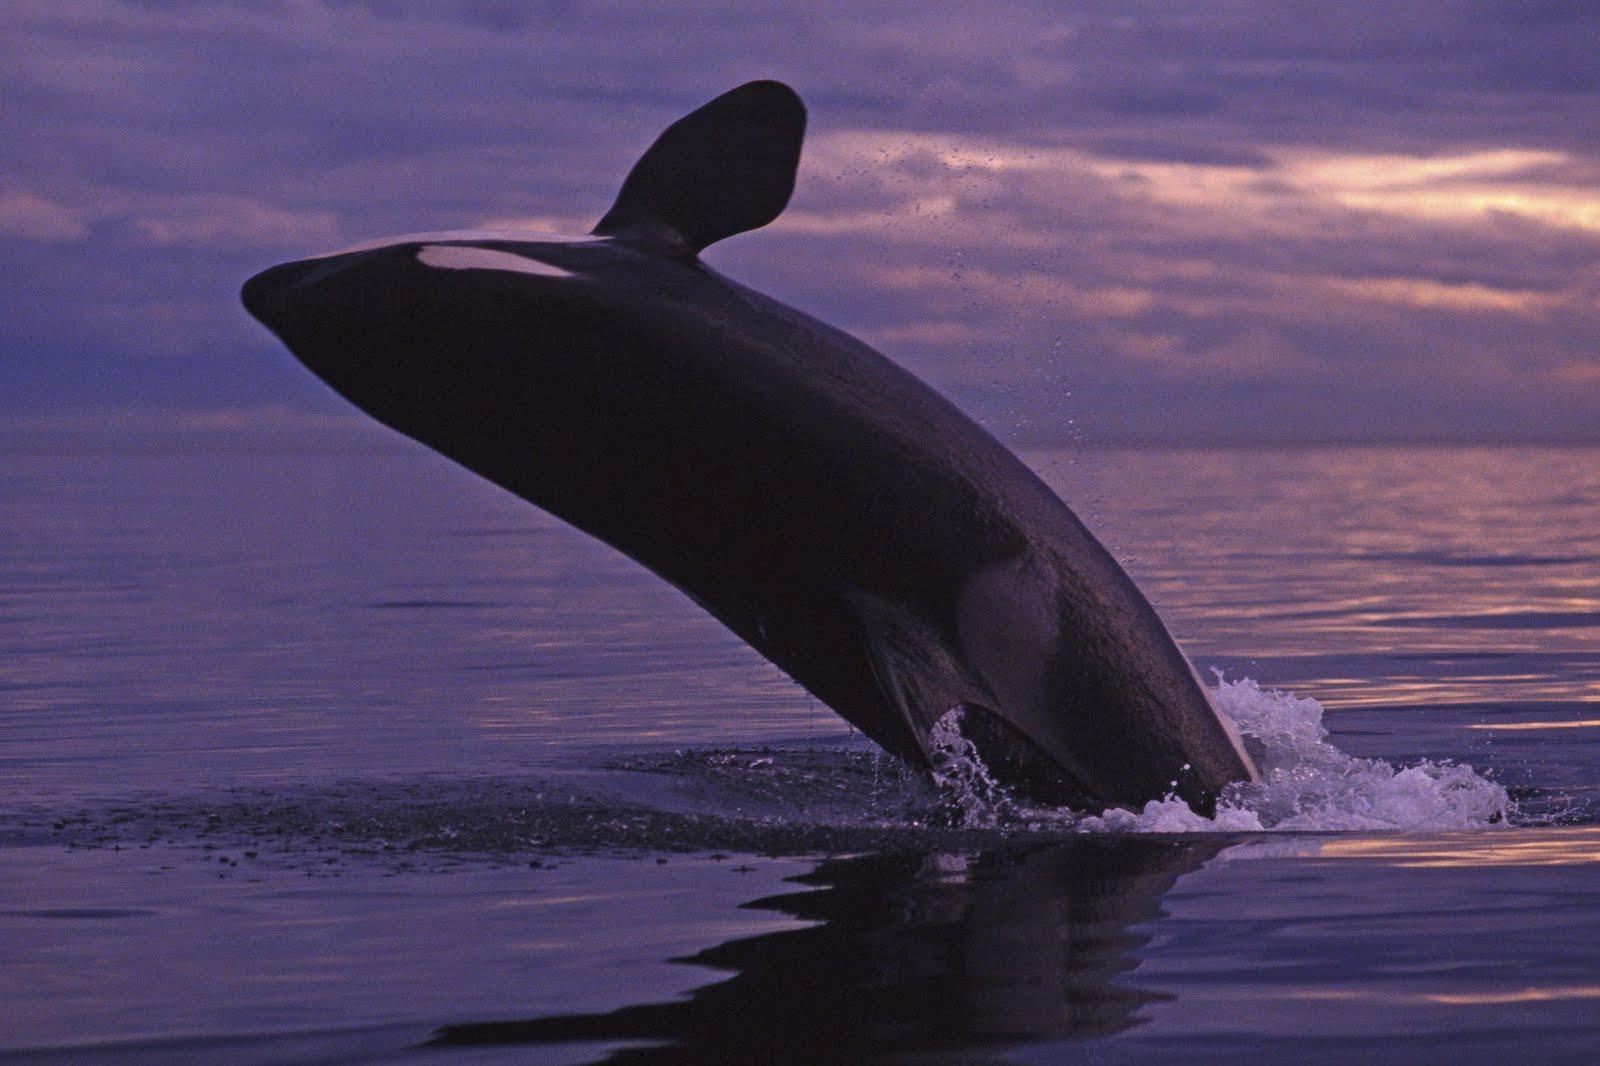 The killer whale movie whales orca the killer whale movie whales altavistaventures Images